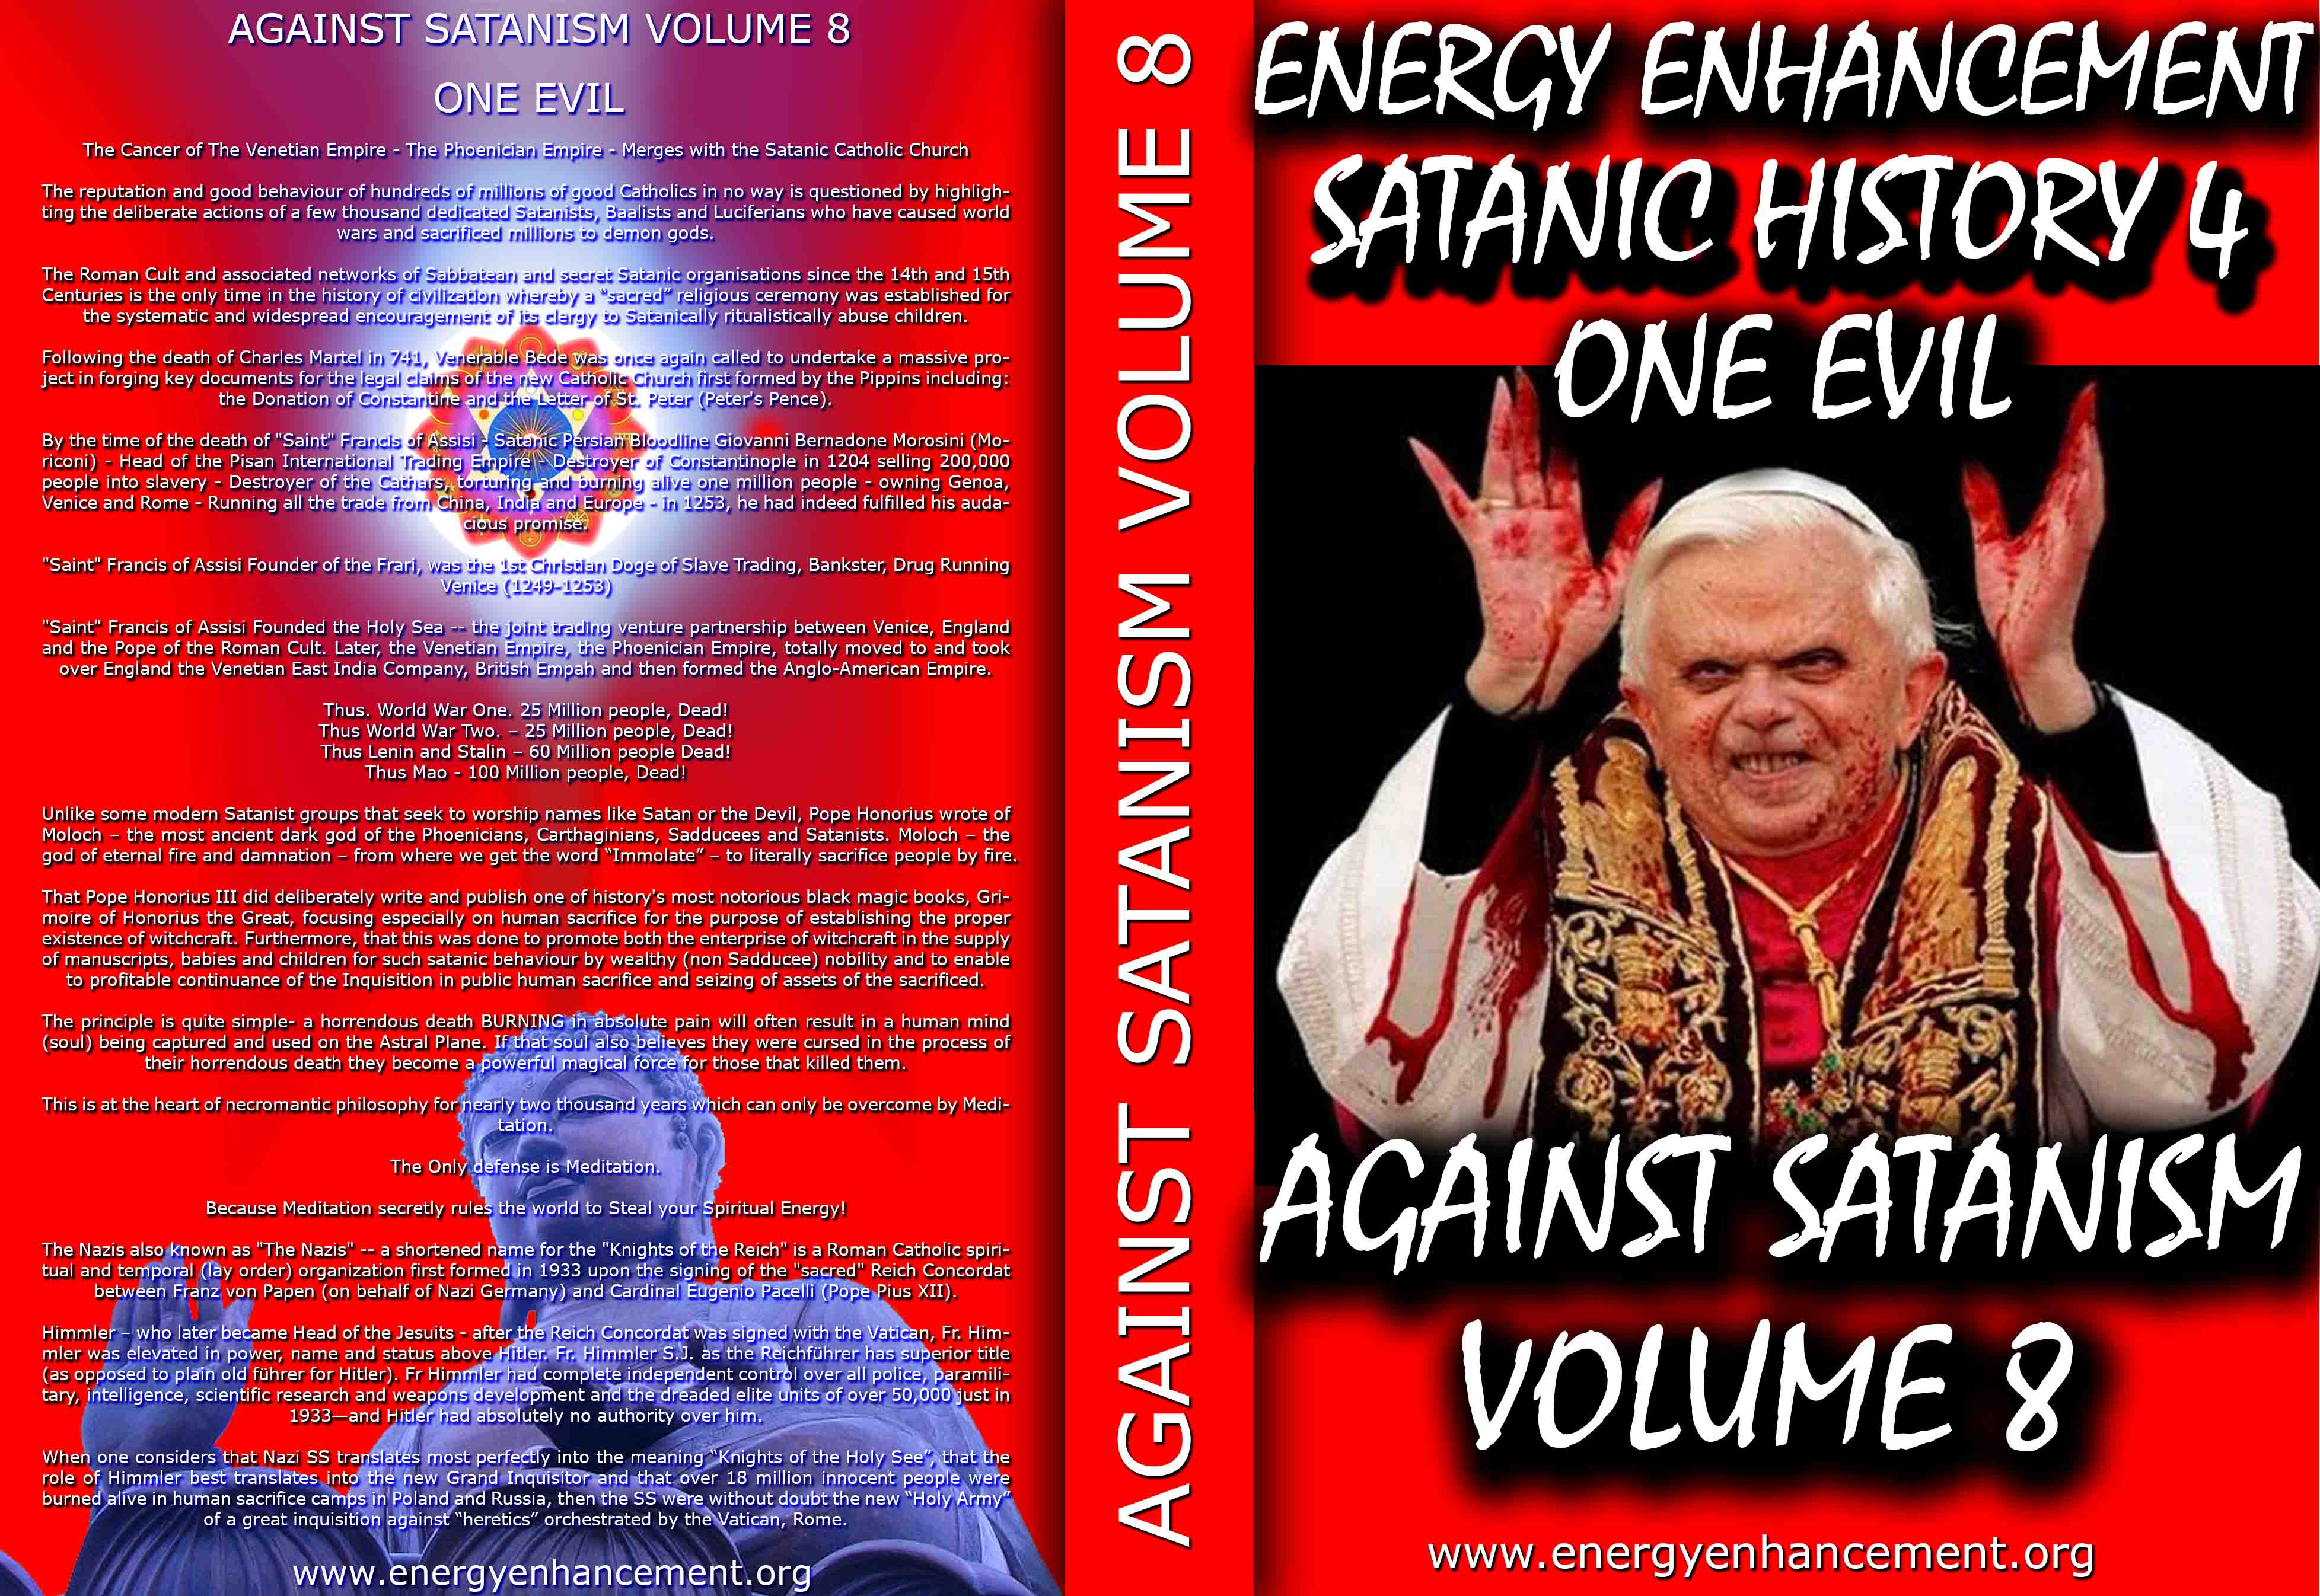 Description: Description: C:\wnew\Sacred-Energy\Against-Satanism-Volume-8\oneevil.jpg